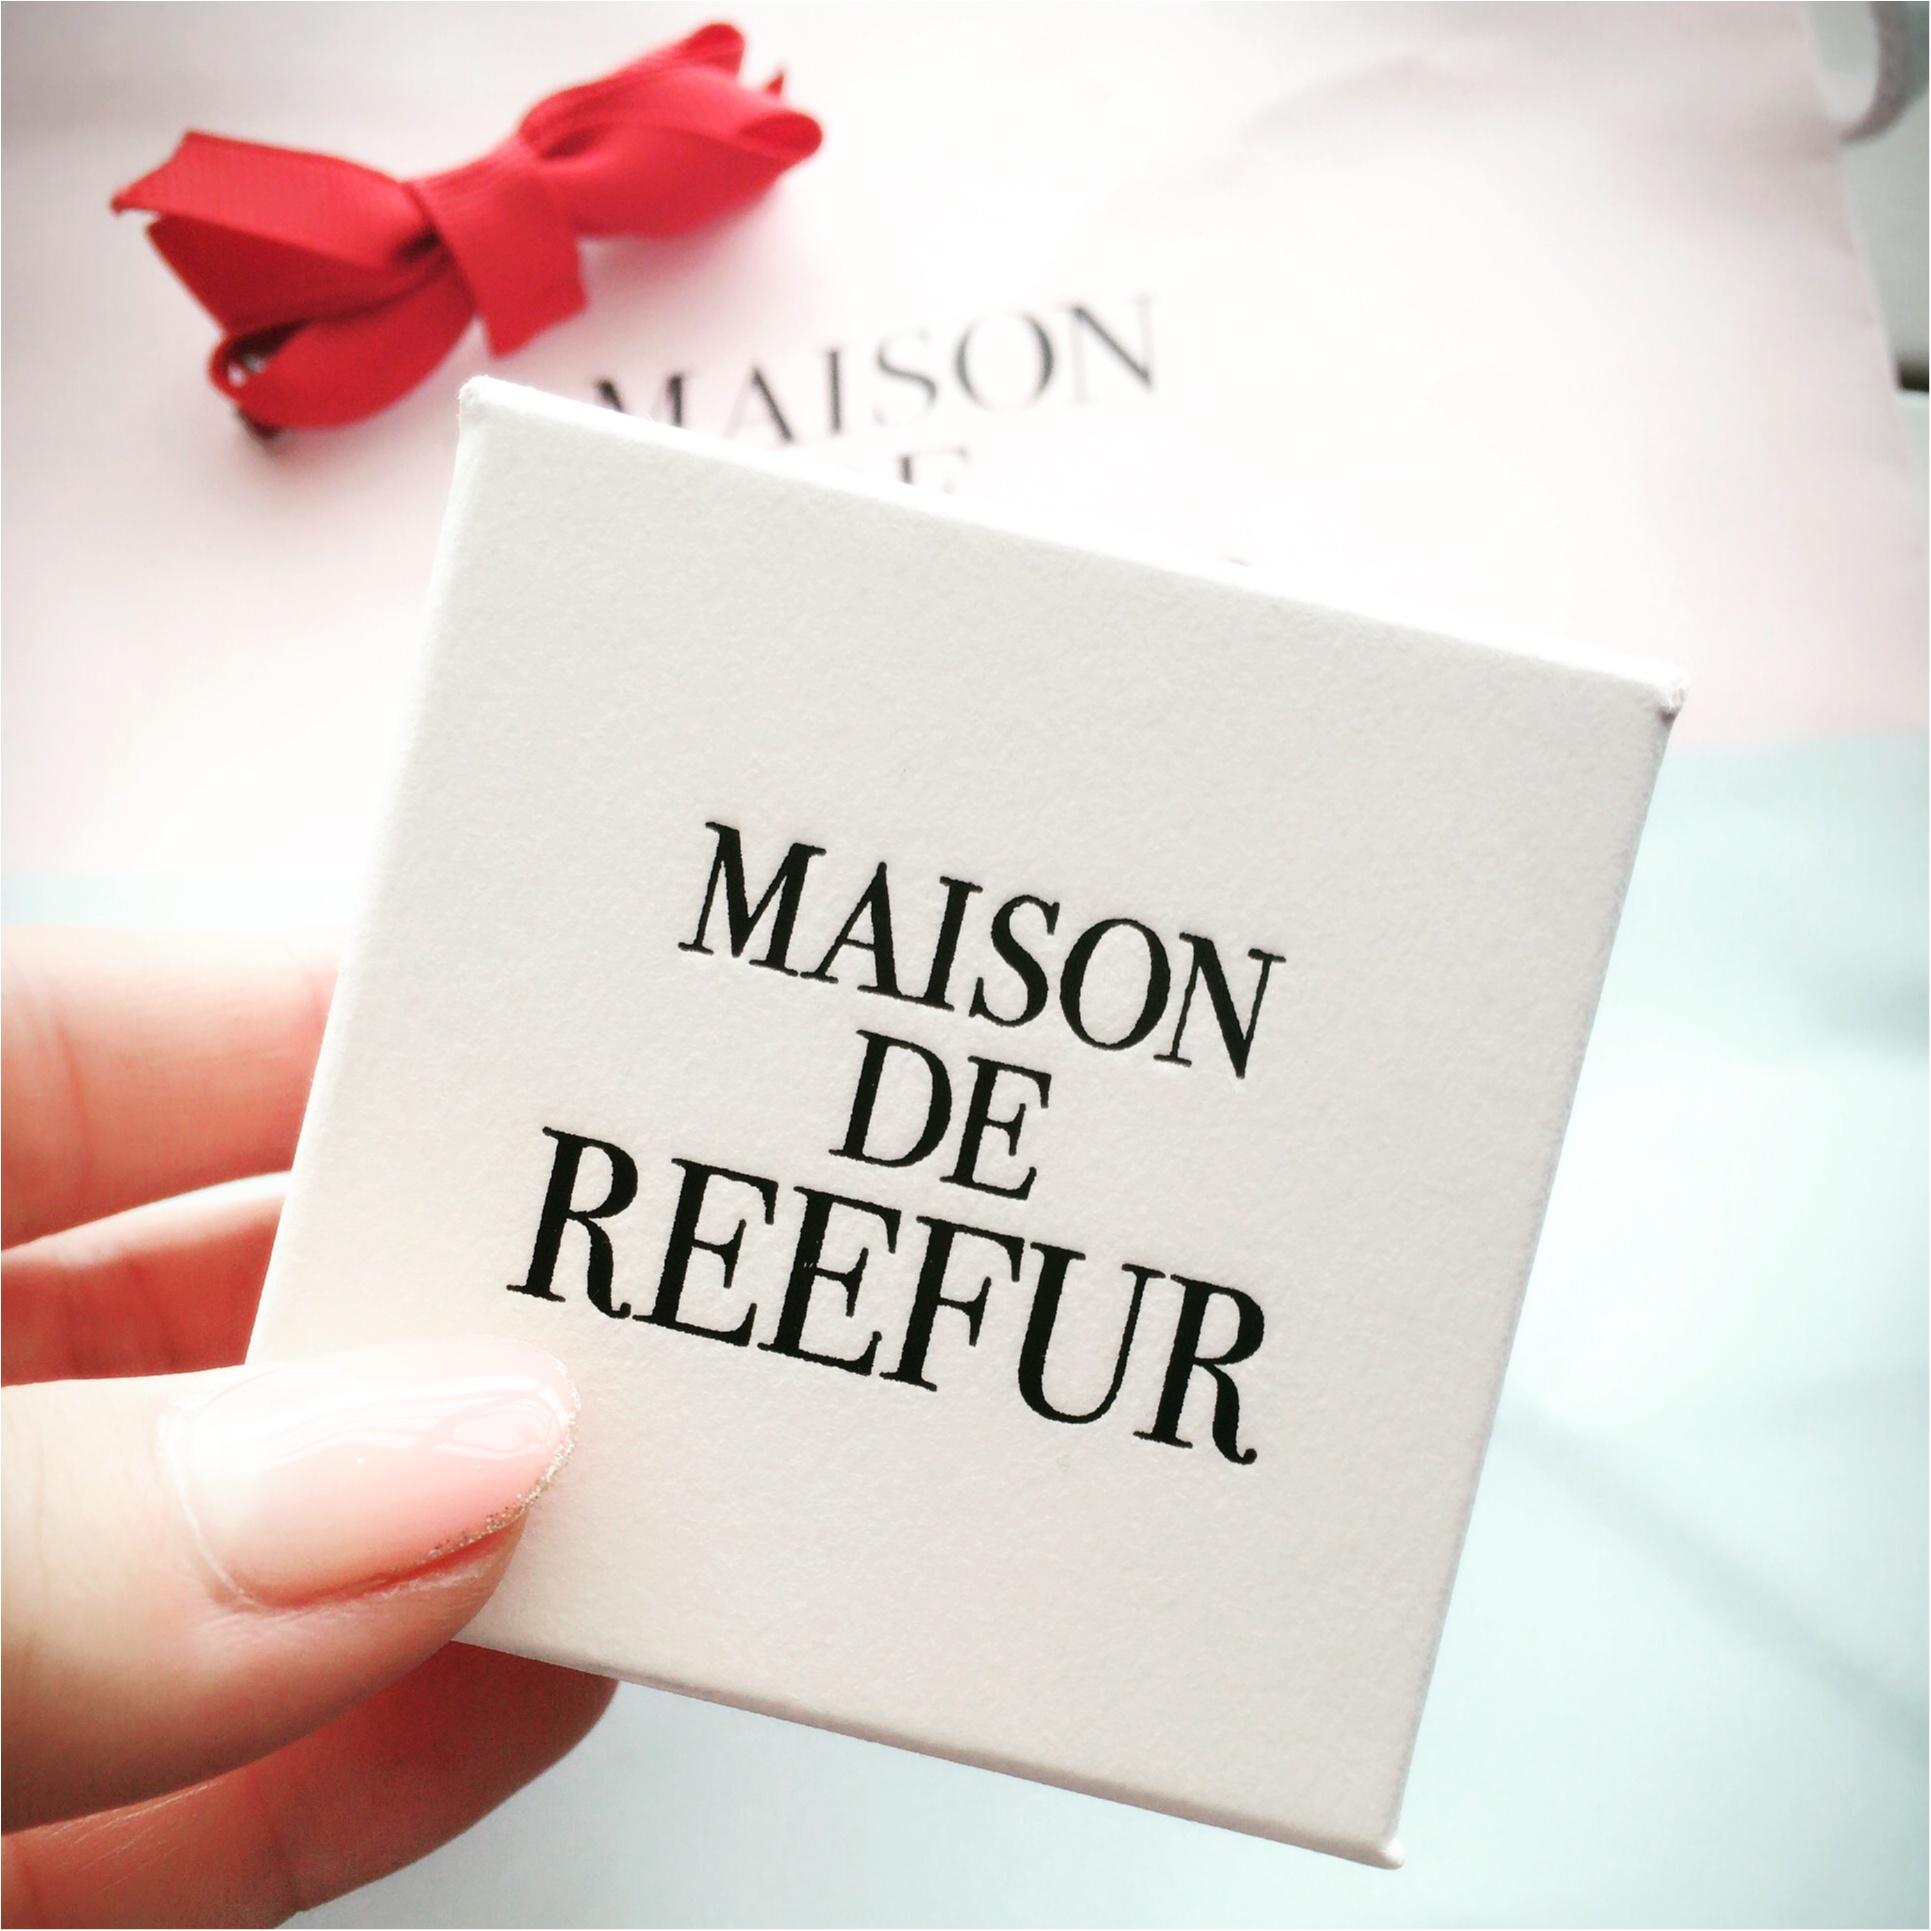 MAISON DE REEFUR KIOSQUEで発見!プチプラきらきらリングにひとめぼれ♡_2